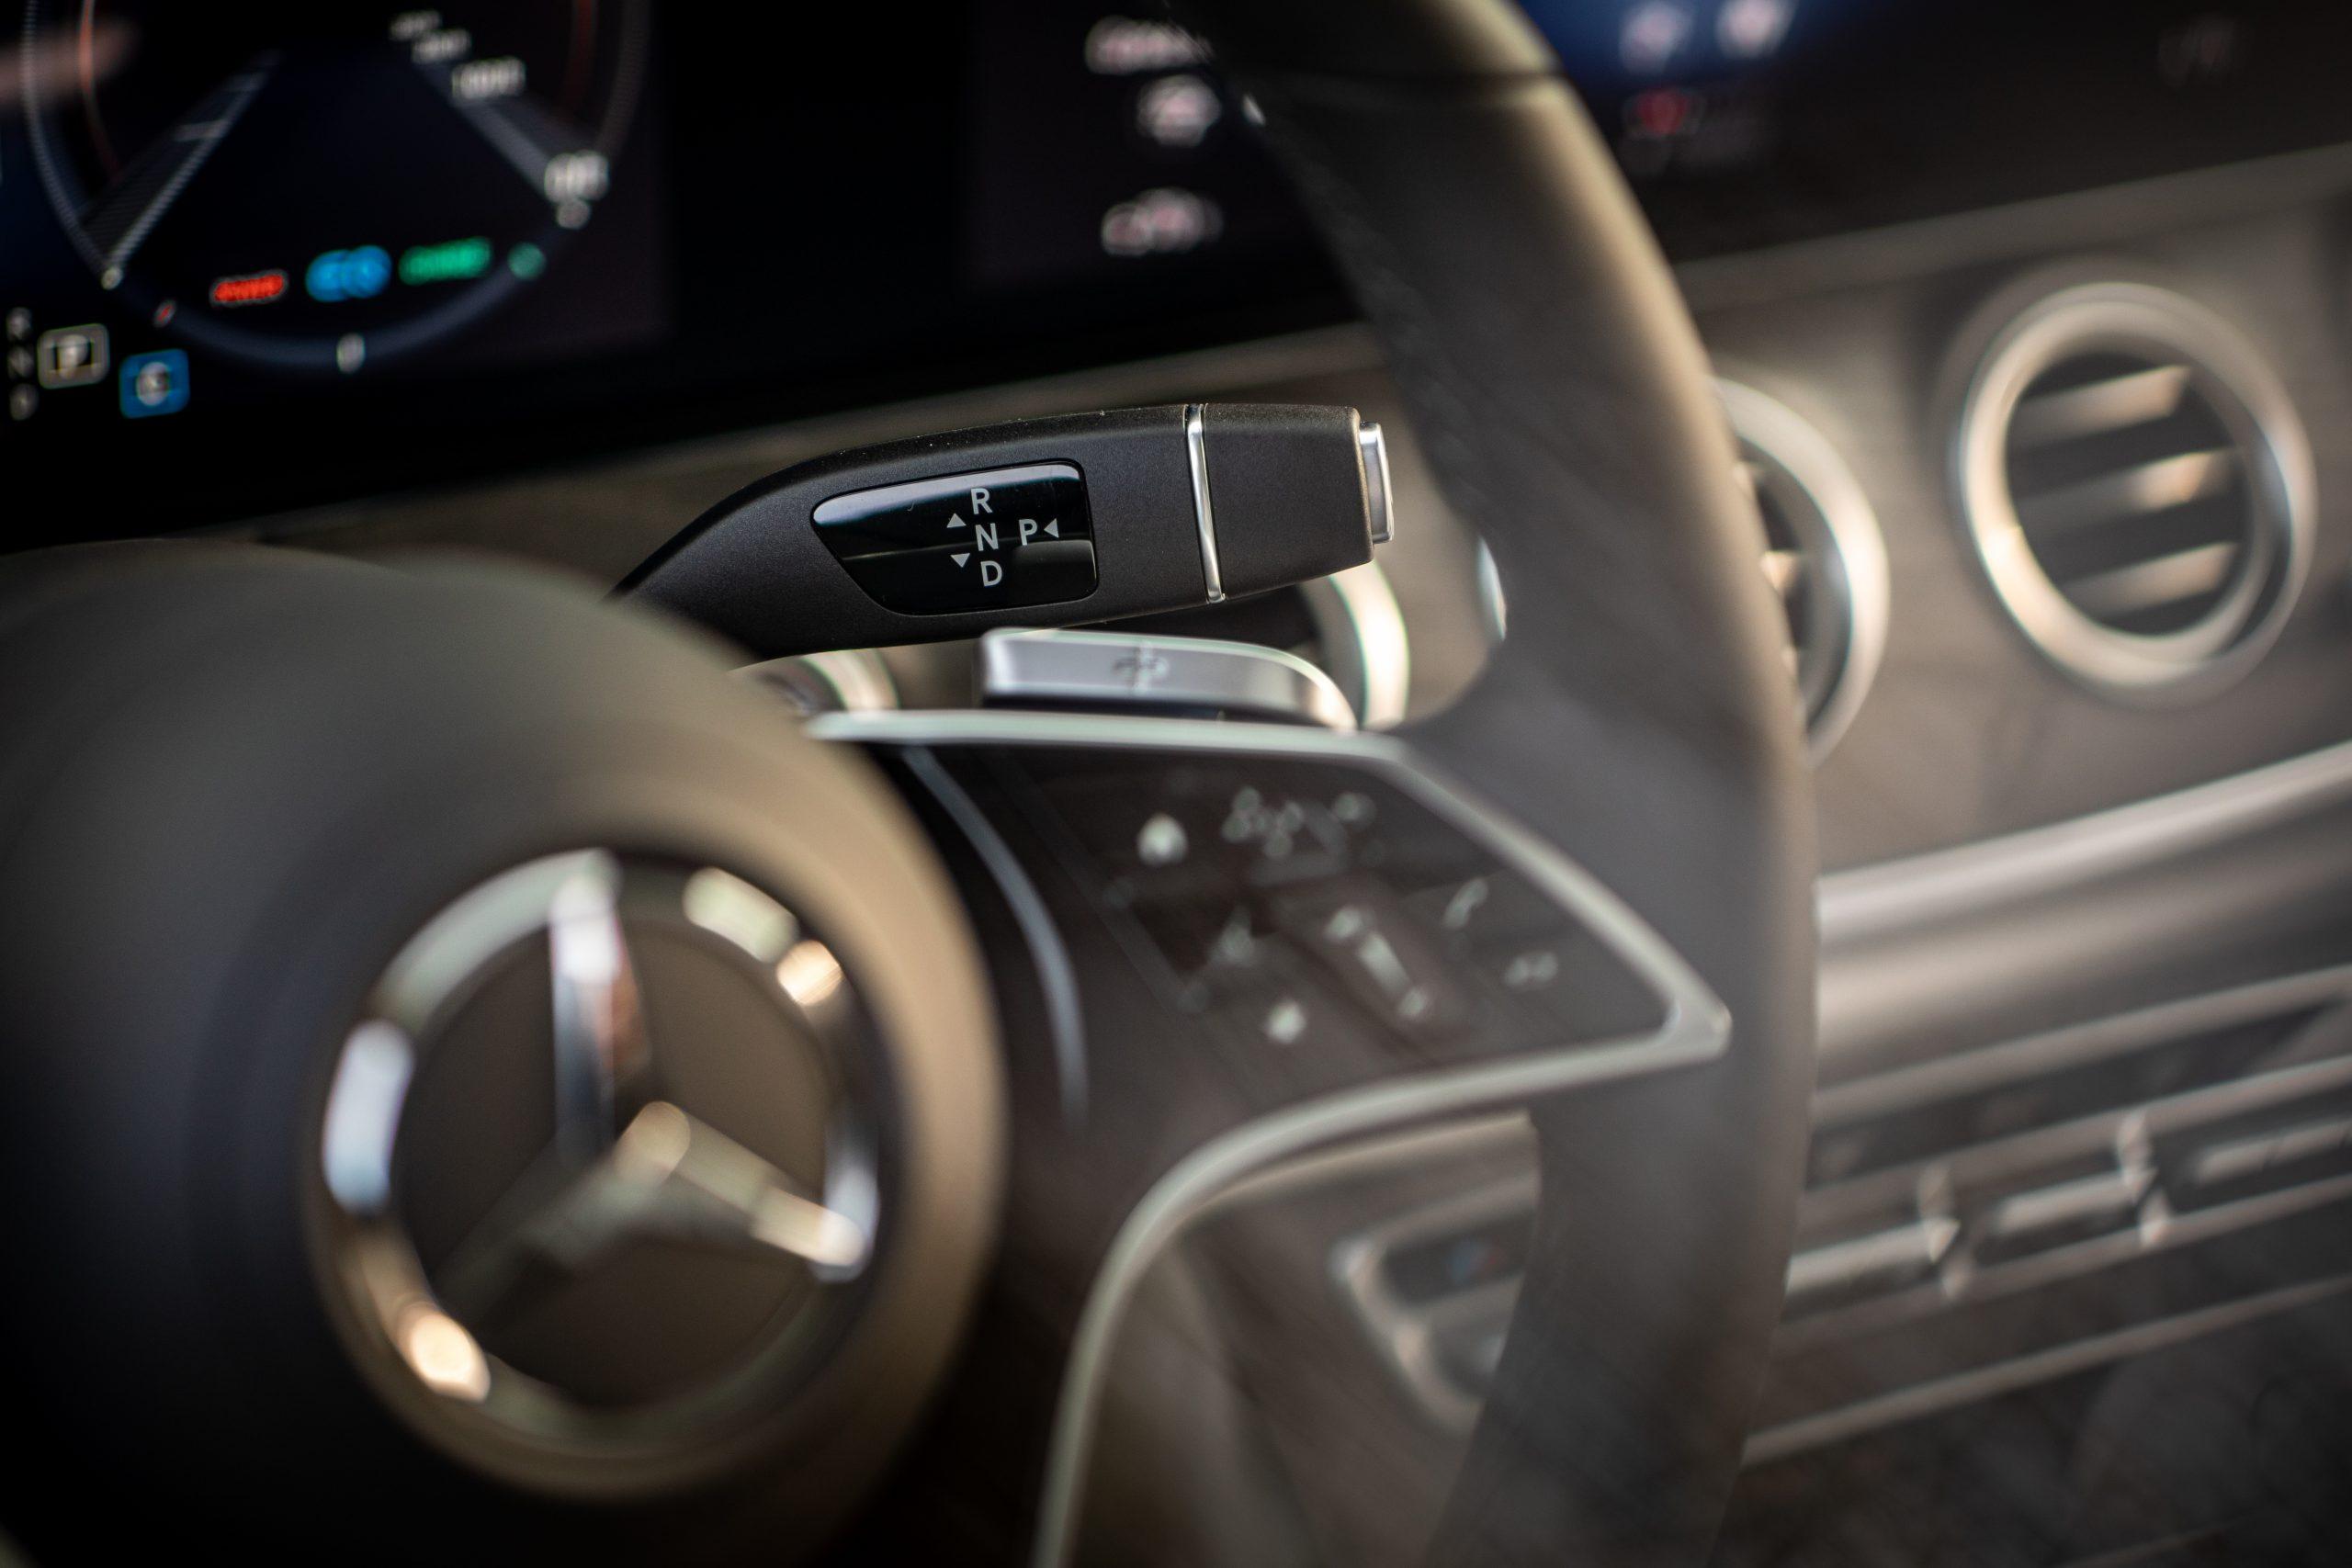 2021 Mercedes Benz E 450 4MATIC shifter